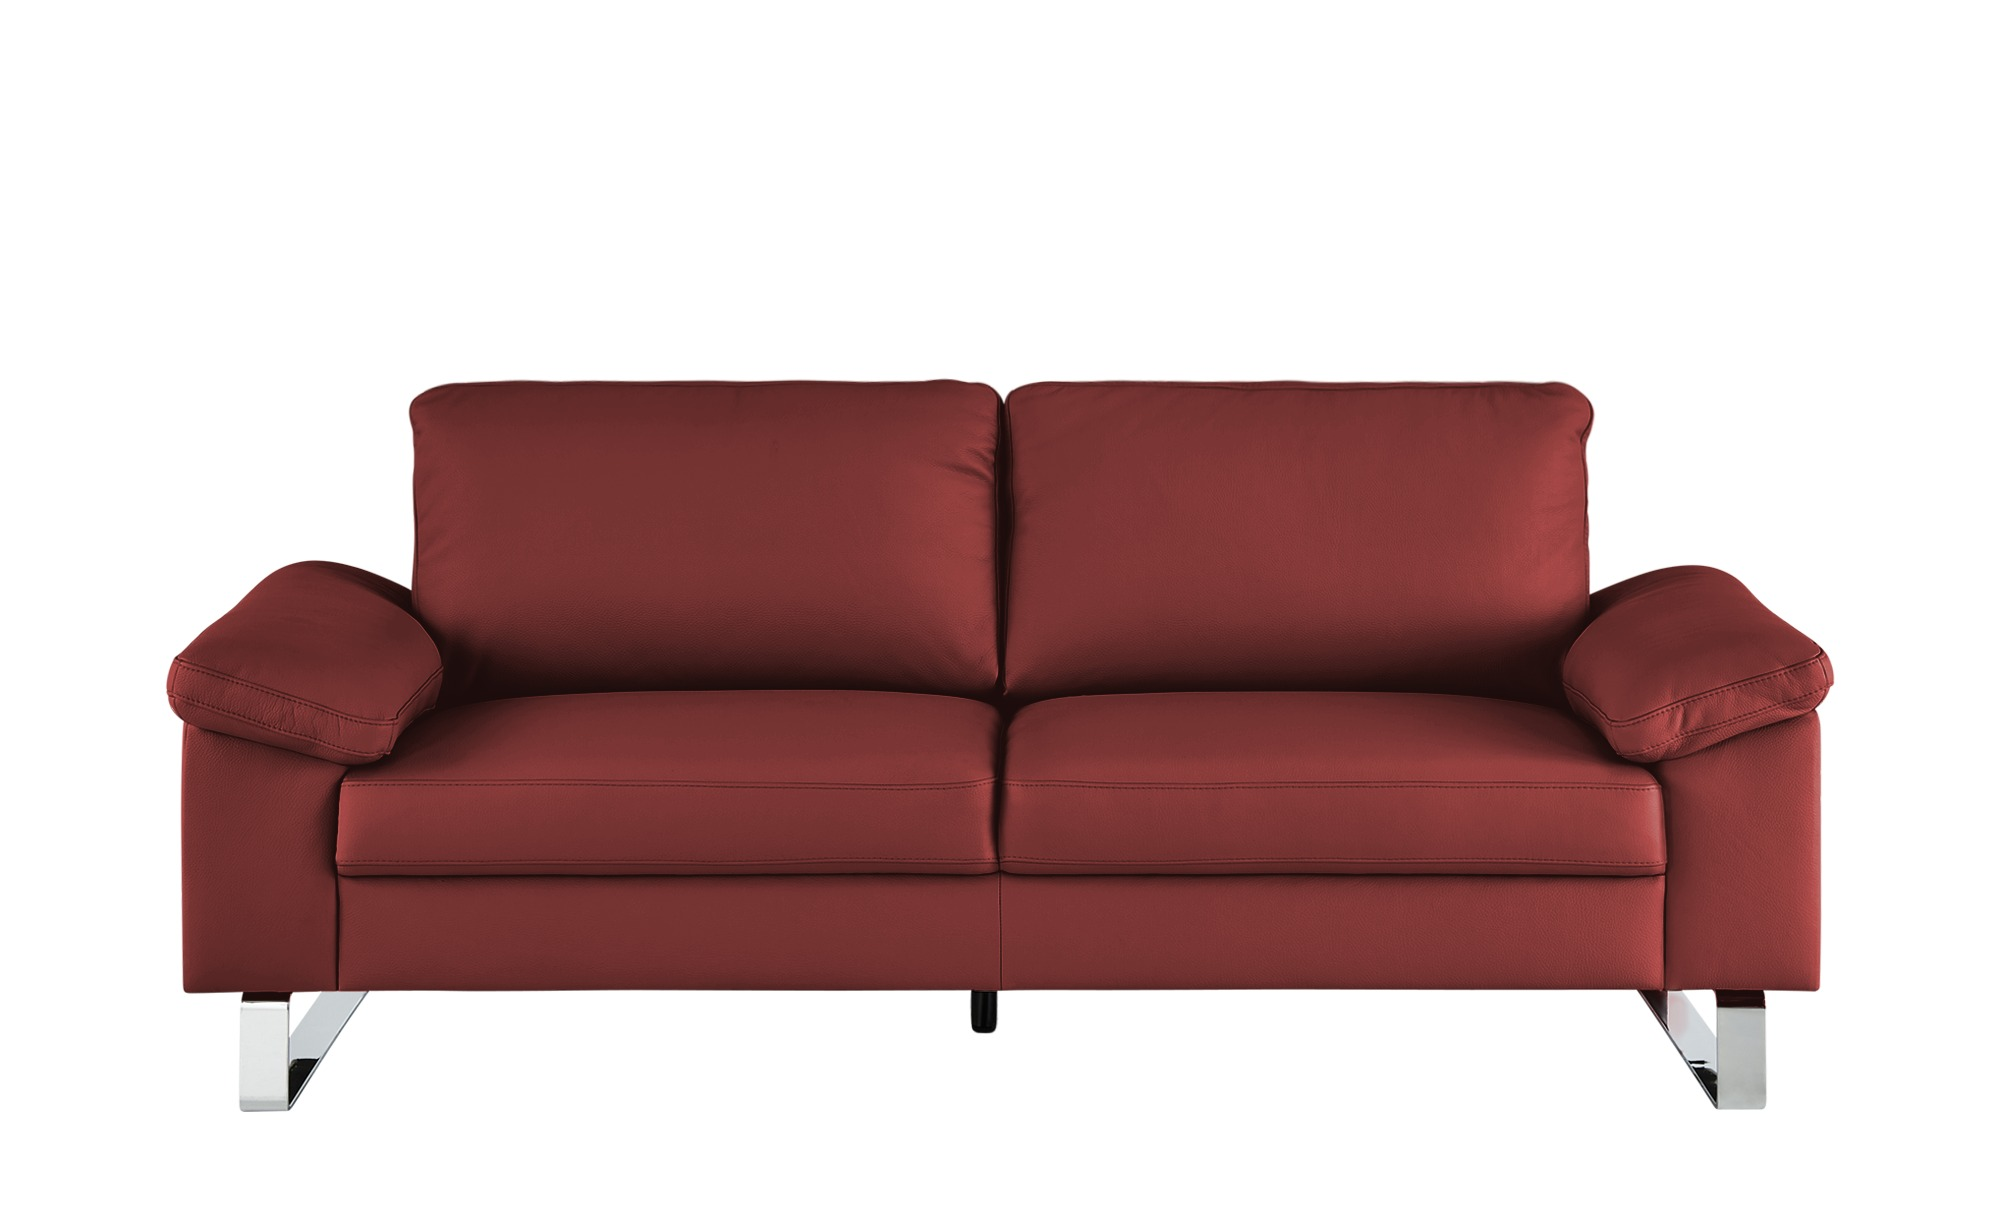 Max Schelling Ledersofa  Maximum ¦ rot ¦ Maße (cm): B: 184 H: 86 T: 97 Polstermöbel > Sofas > 2-Sitzer - Höffner